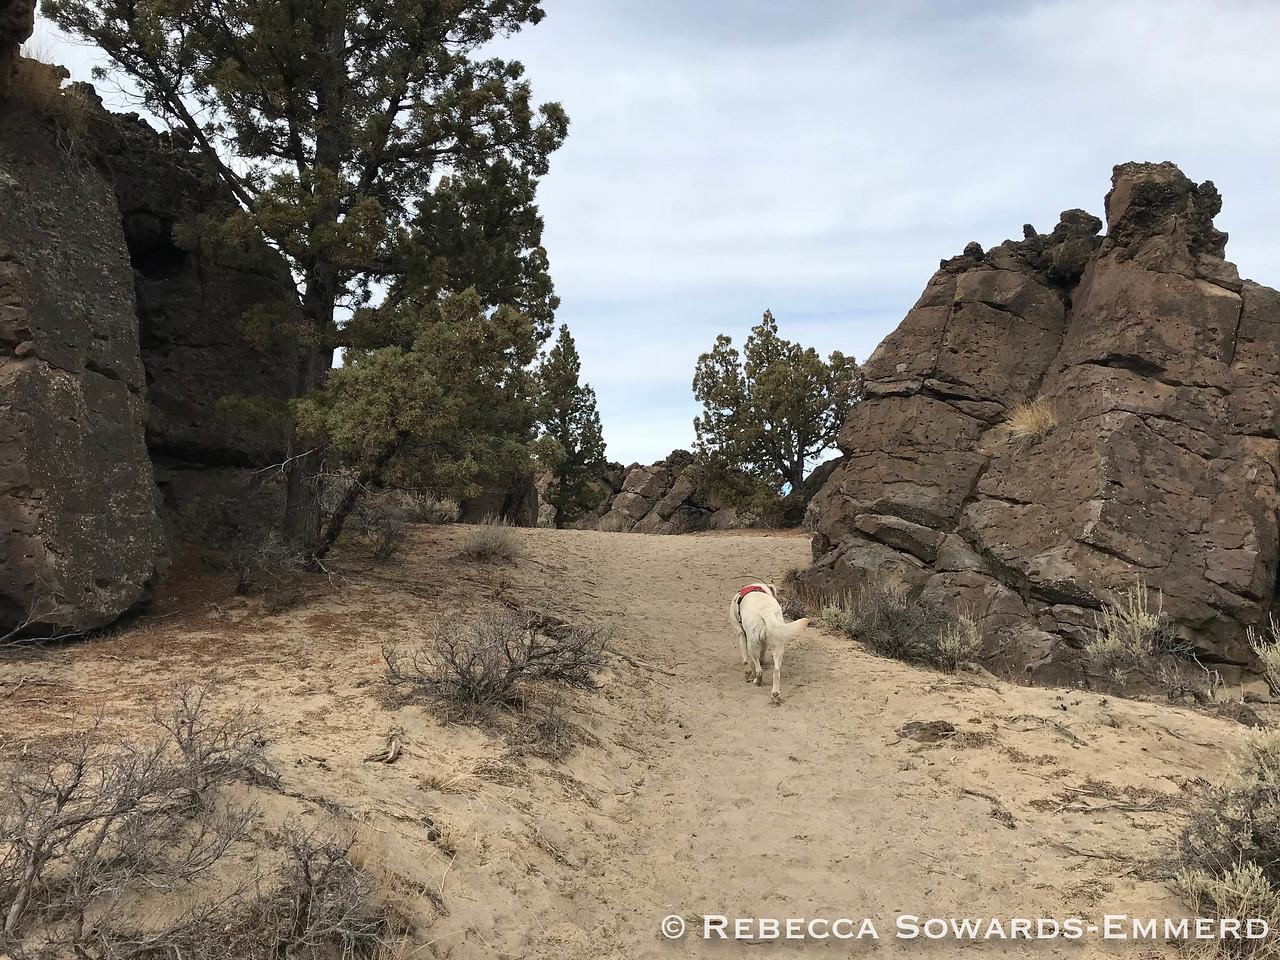 Hiking to the top of Flatiron Rock